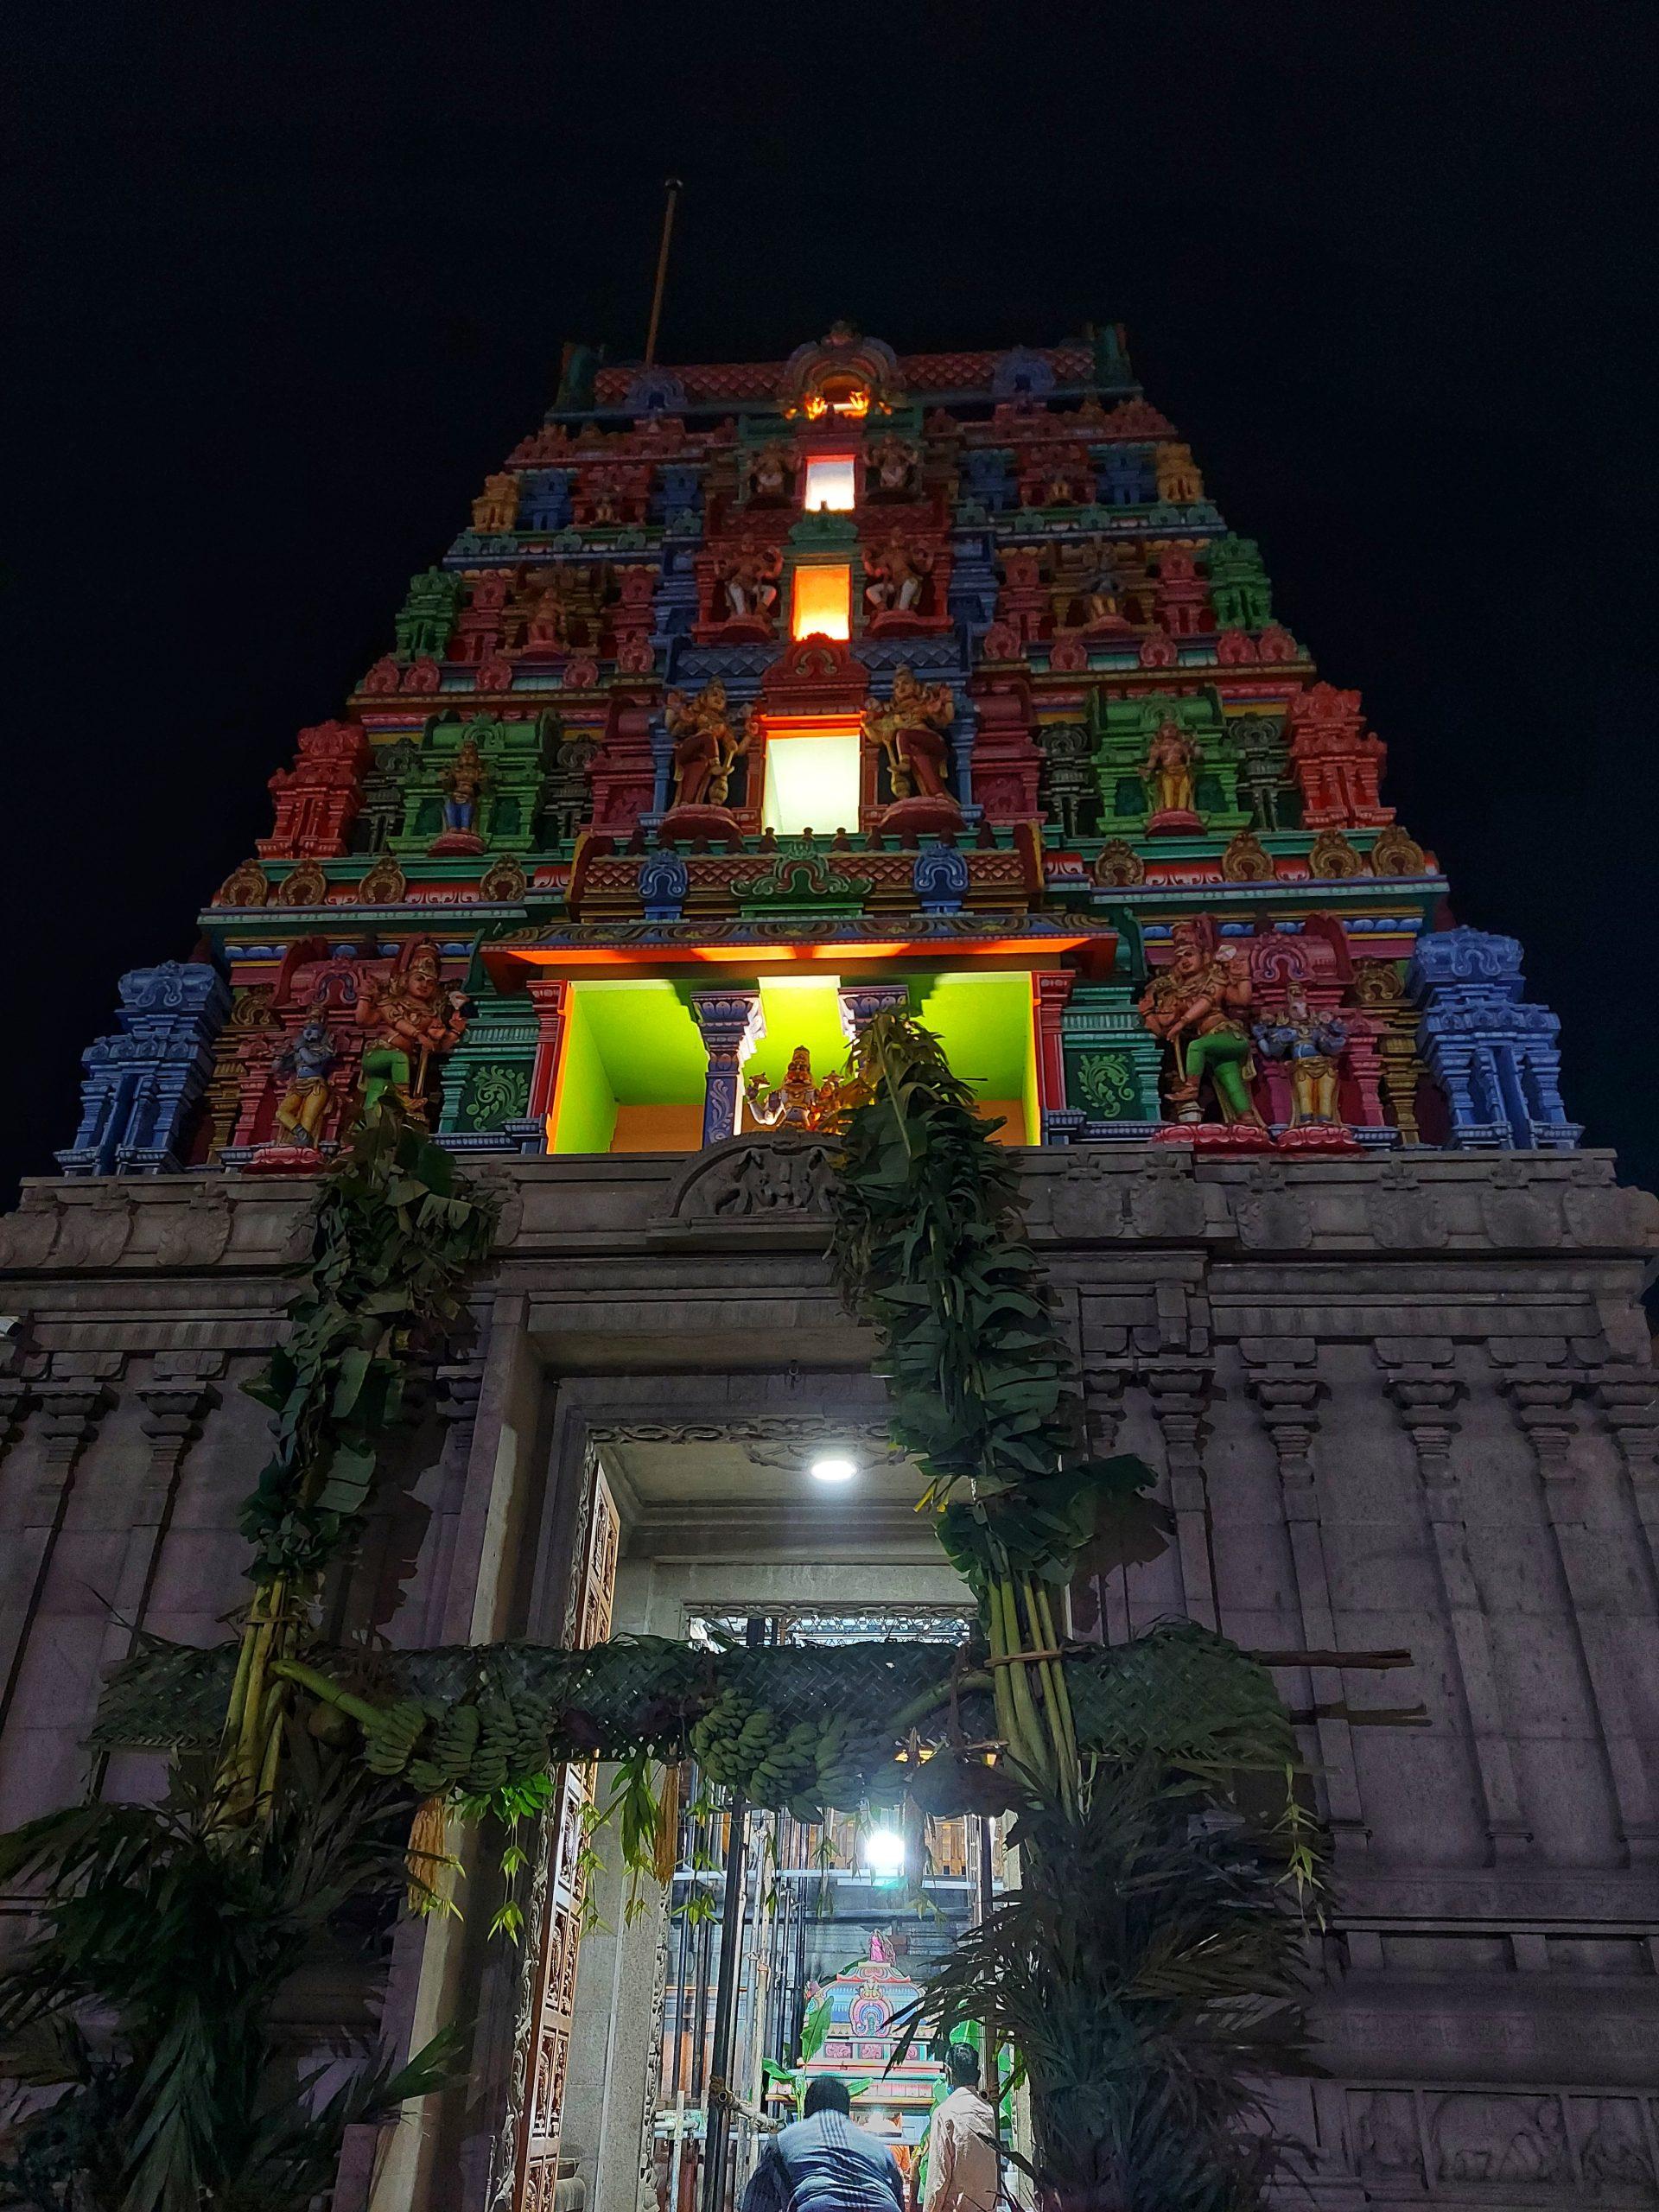 Sri Lakshmi Narasimhar Temple in Coimbatore